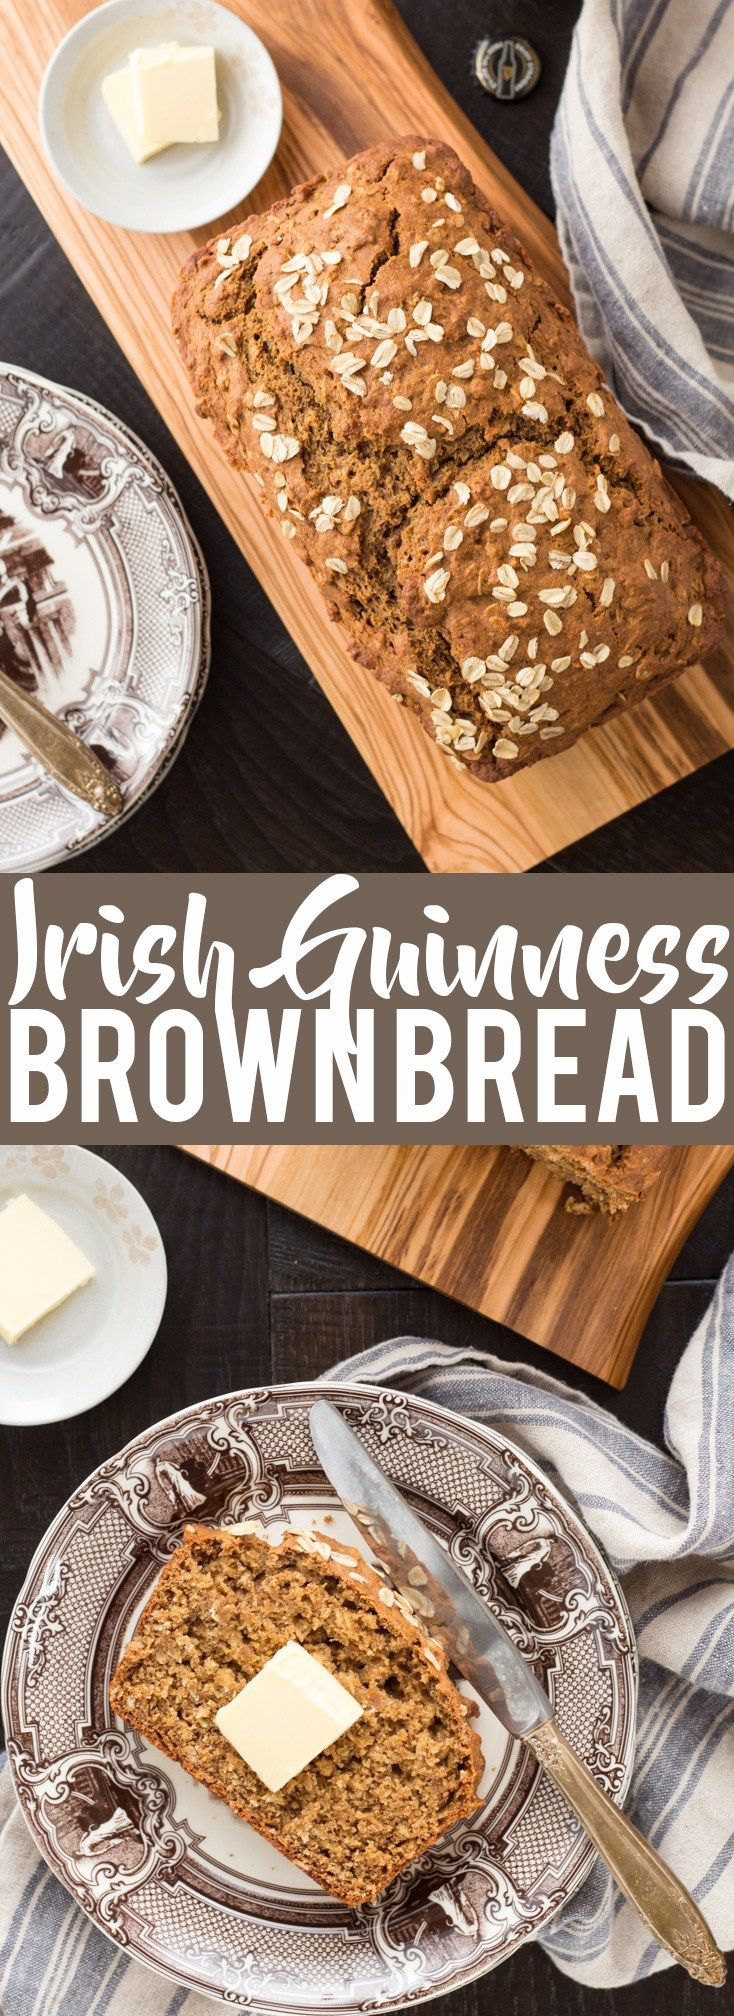 Irish Guinness Brown Bread   Saint Patrick's Day Recipes   Irish Recipes   Quick Bread Recipes   Beer Bread